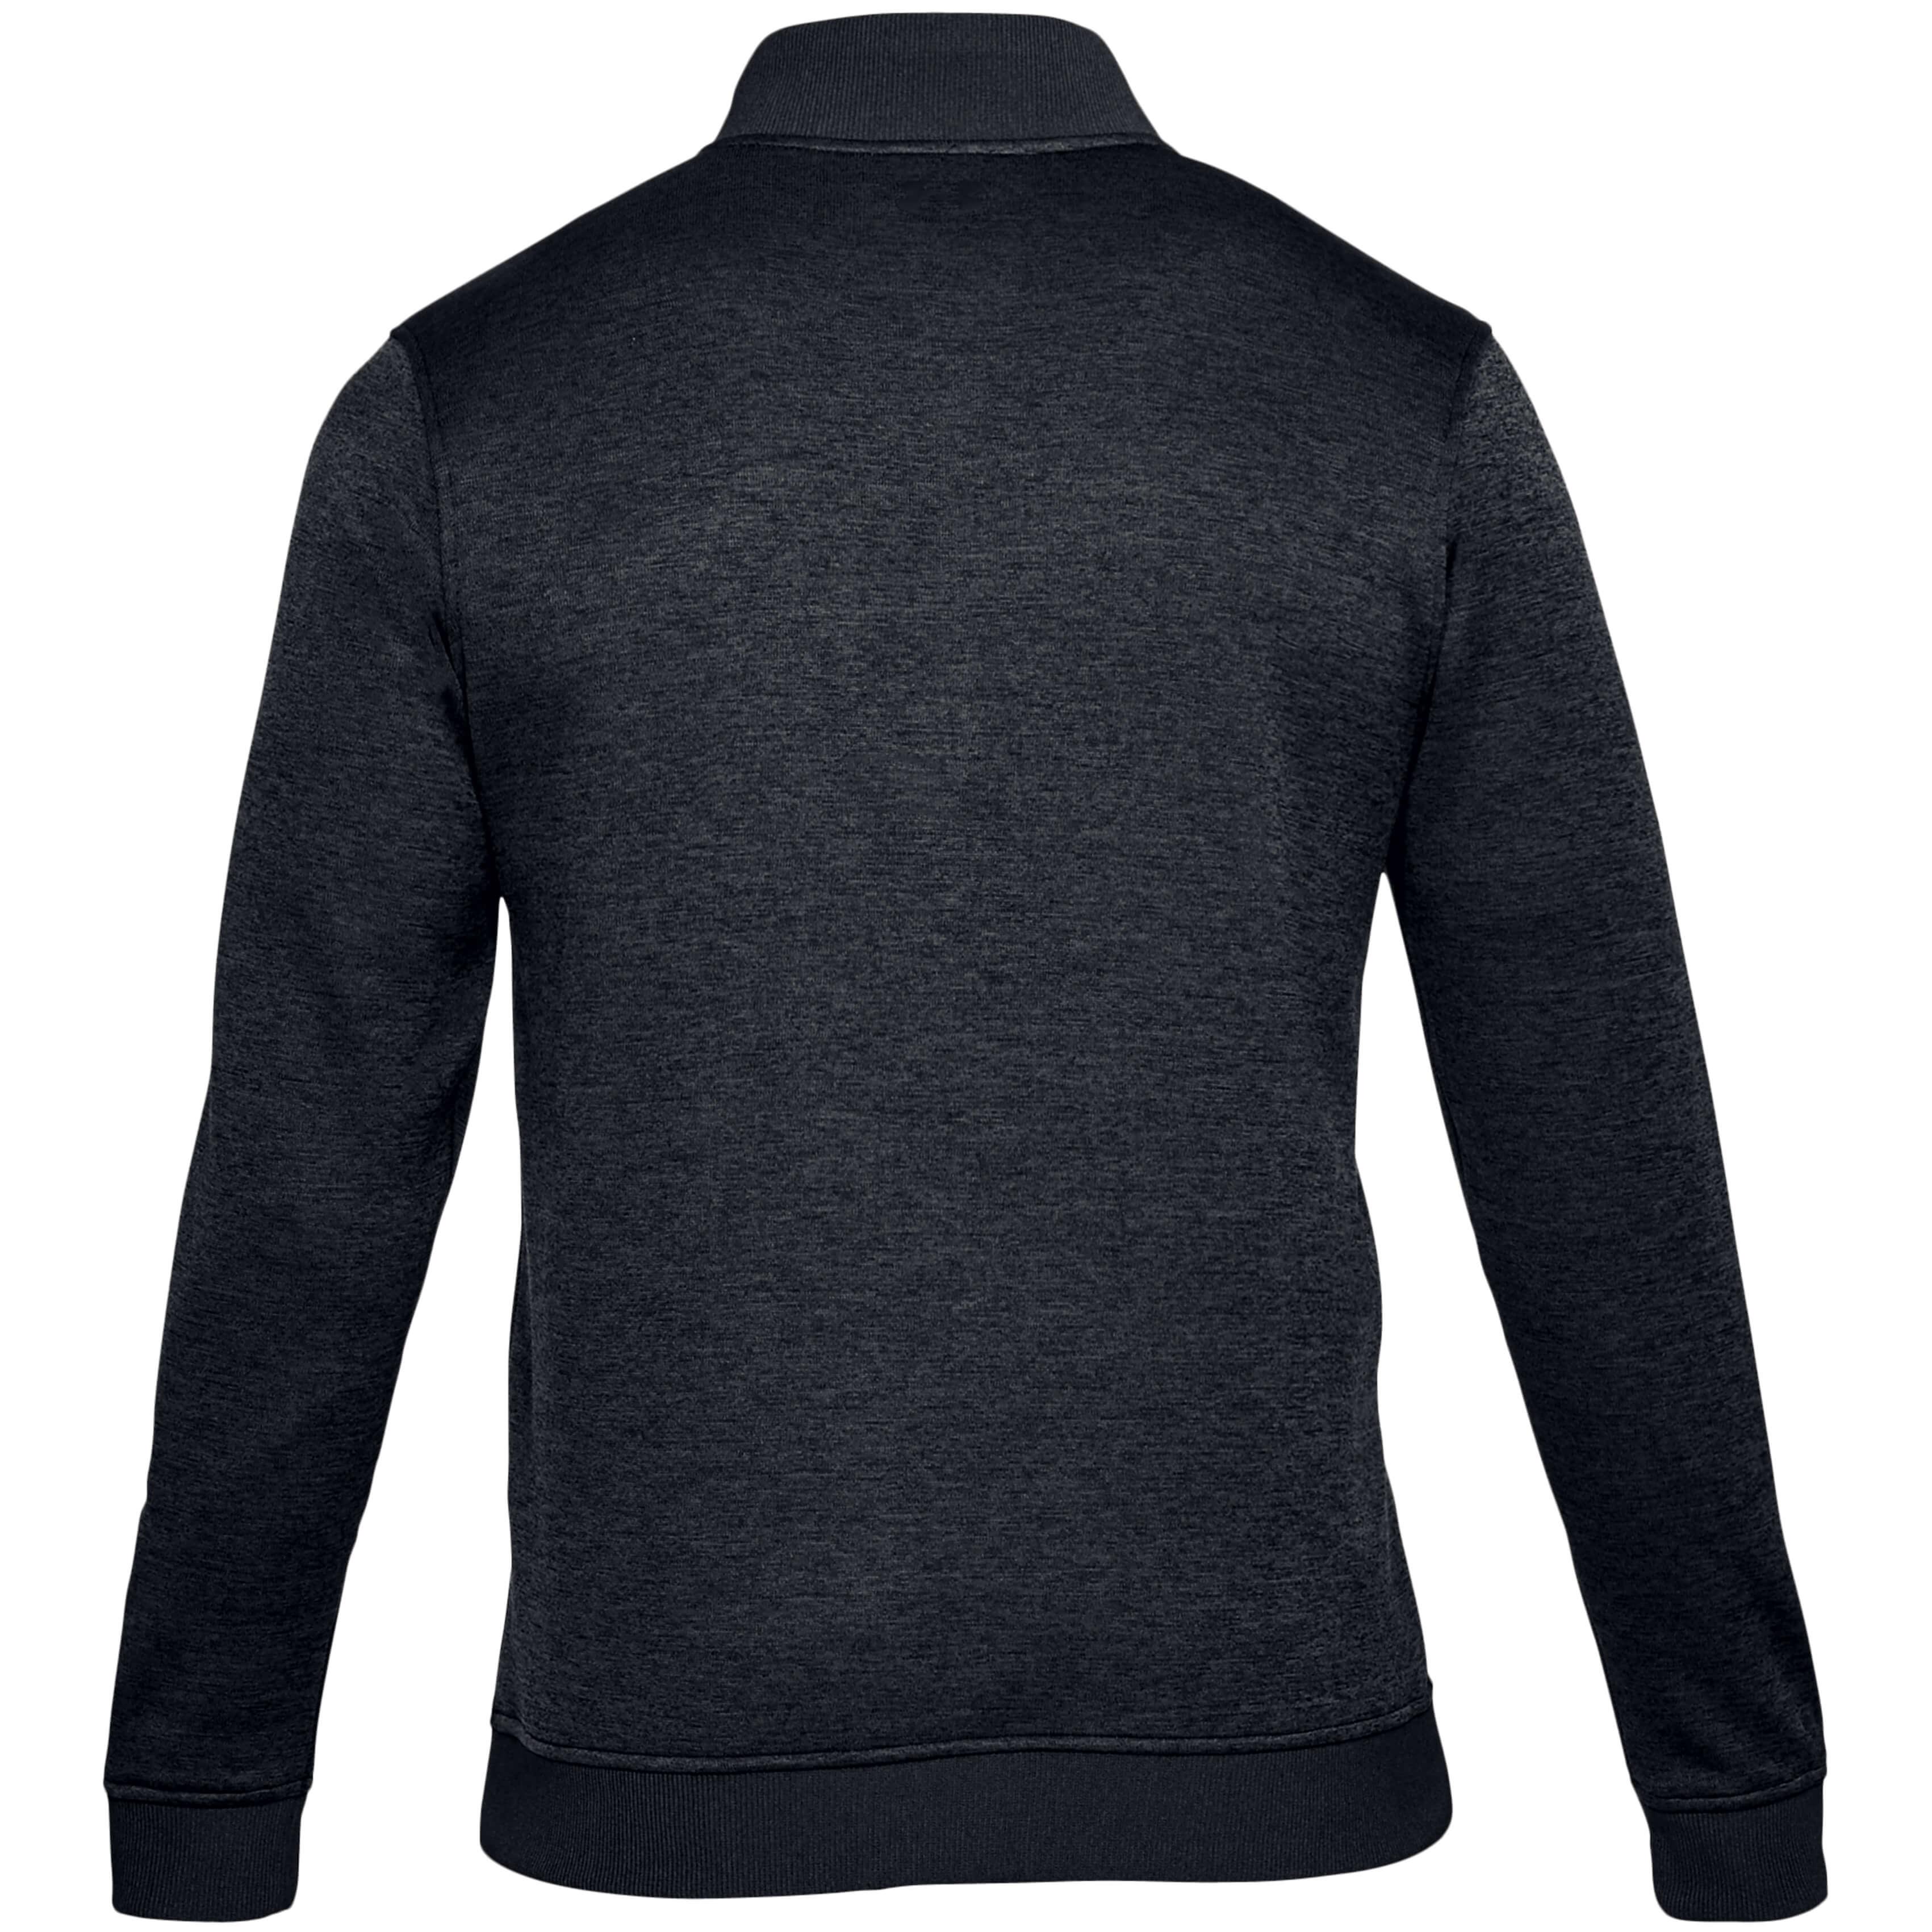 Under-Armour-Mens-UA-Storm-Sweater-Fleece-1-4-Zip-Pullover-Jumper-25-OFF-RRP thumbnail 10